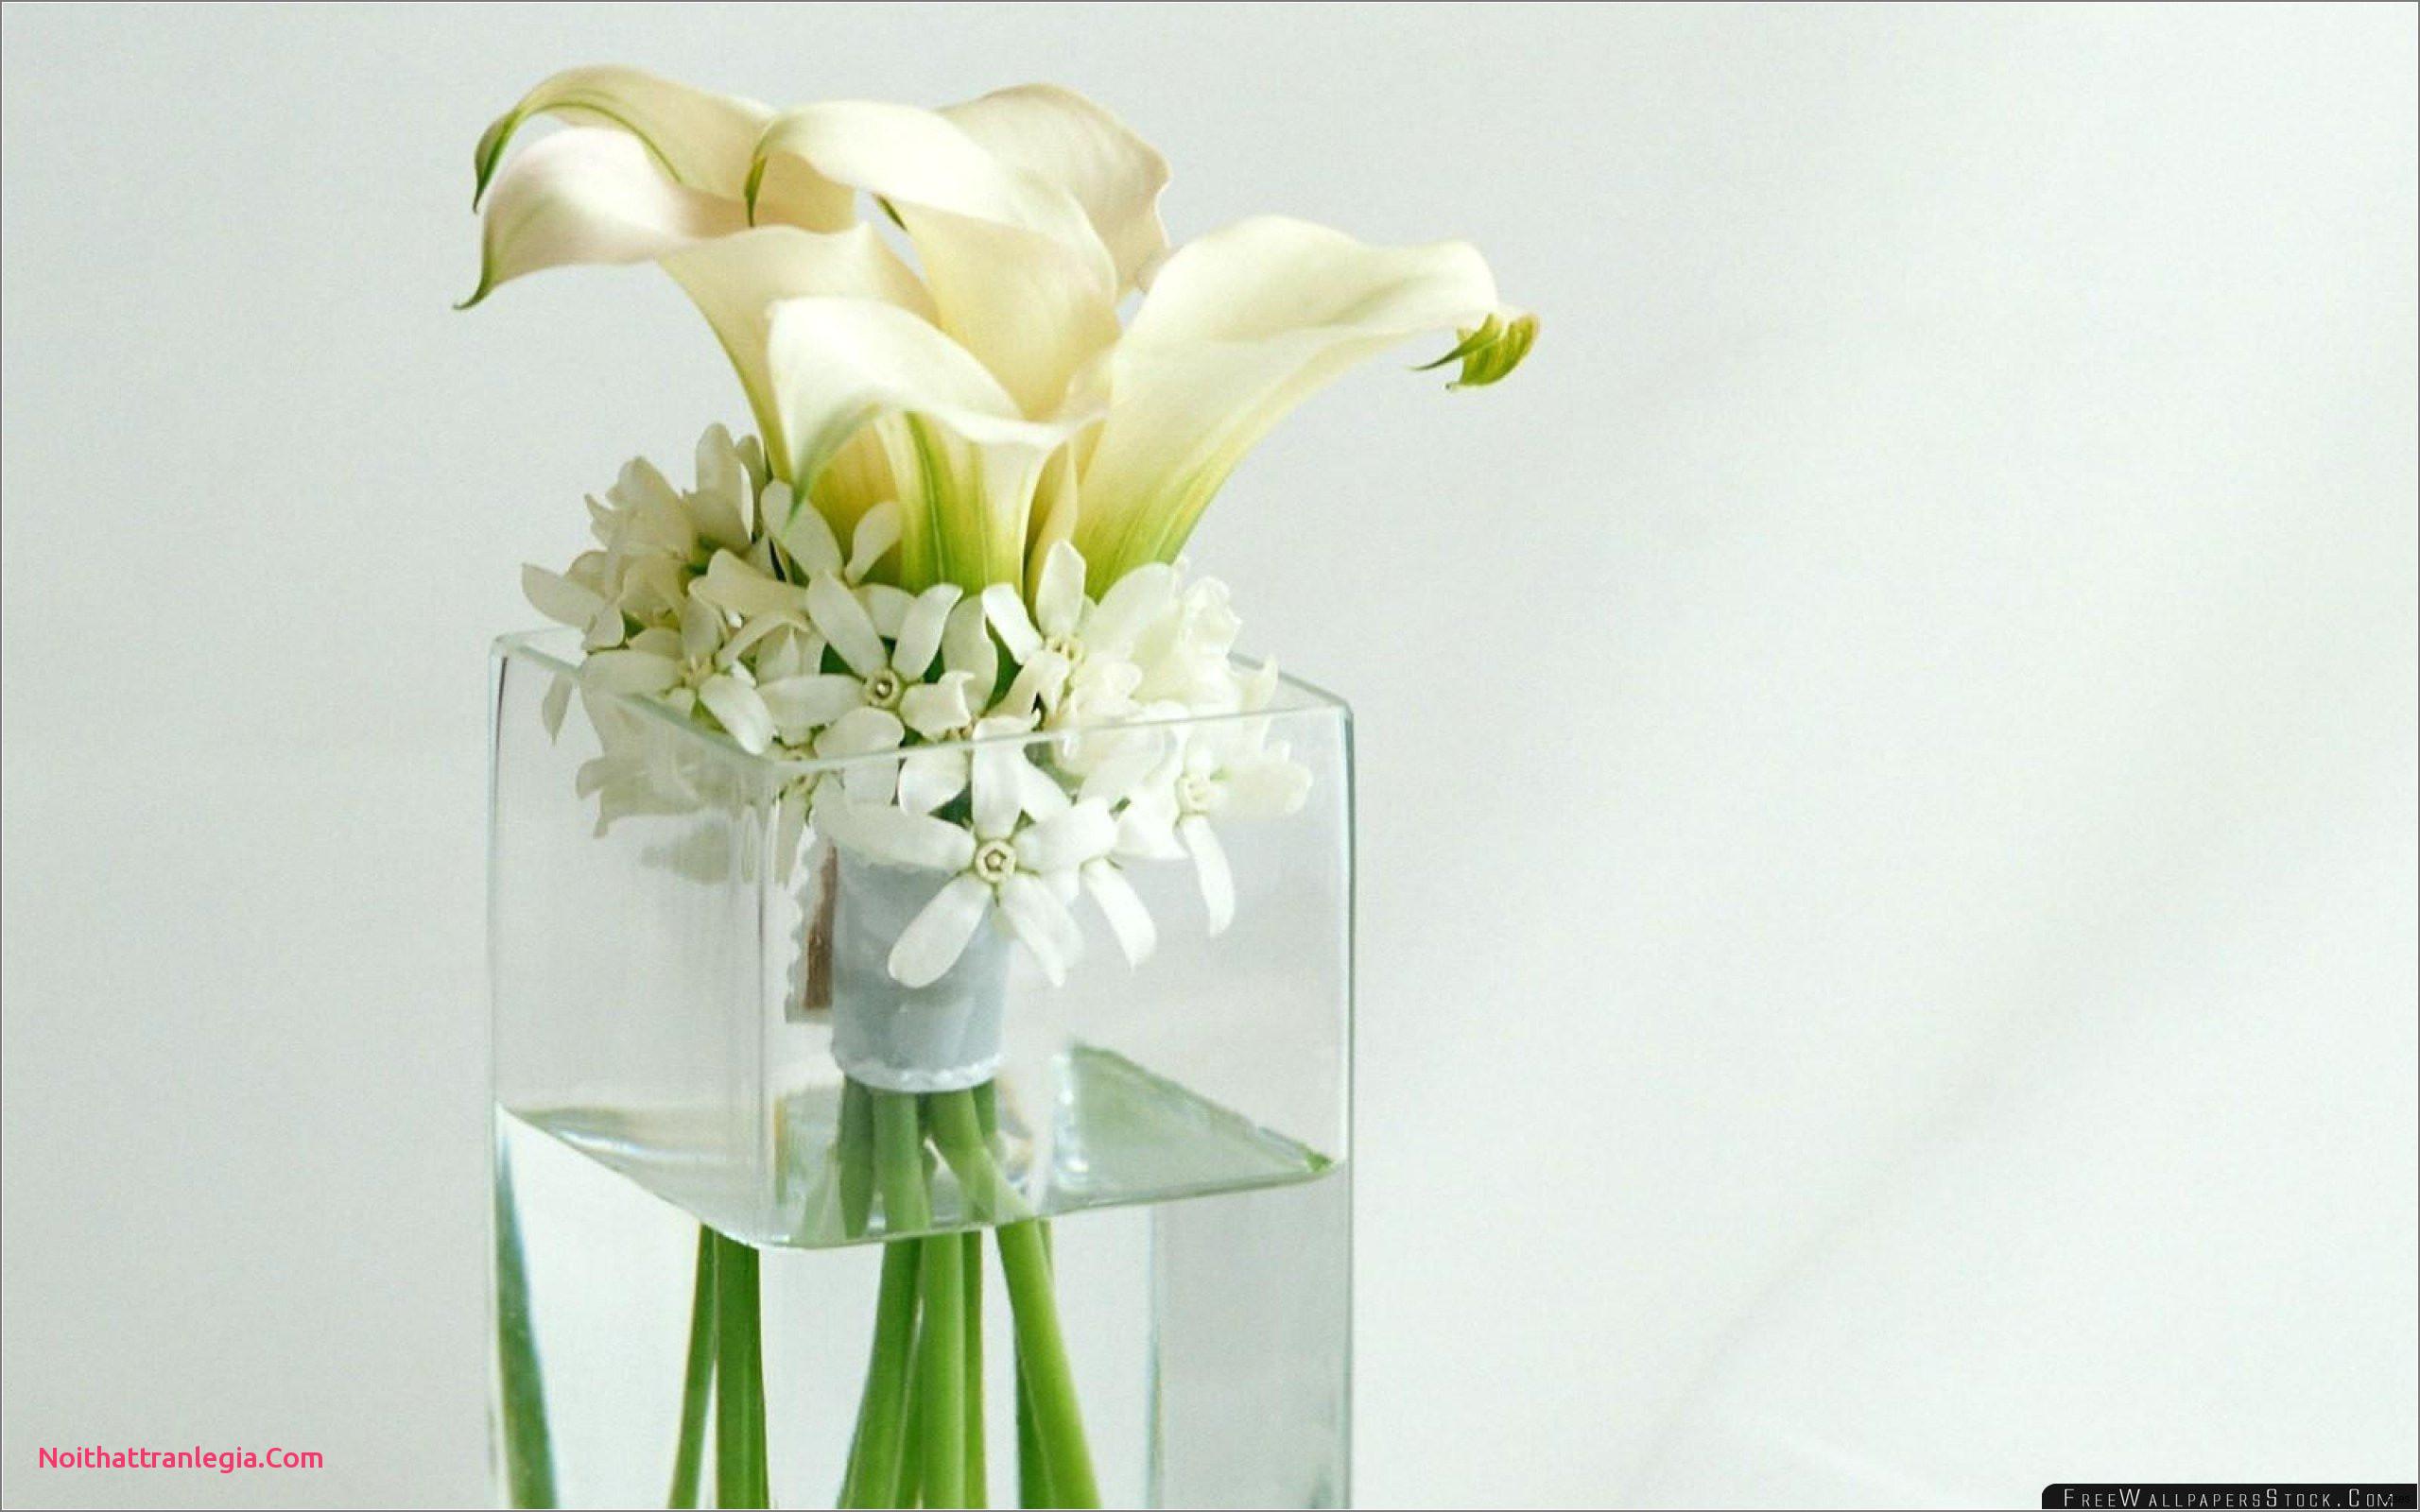 grey vase set of 20 wedding vases noithattranlegia vases design with wedding petals amazing tall vase centerpiece ideas vases flowers in water 0d artificial 2560 87